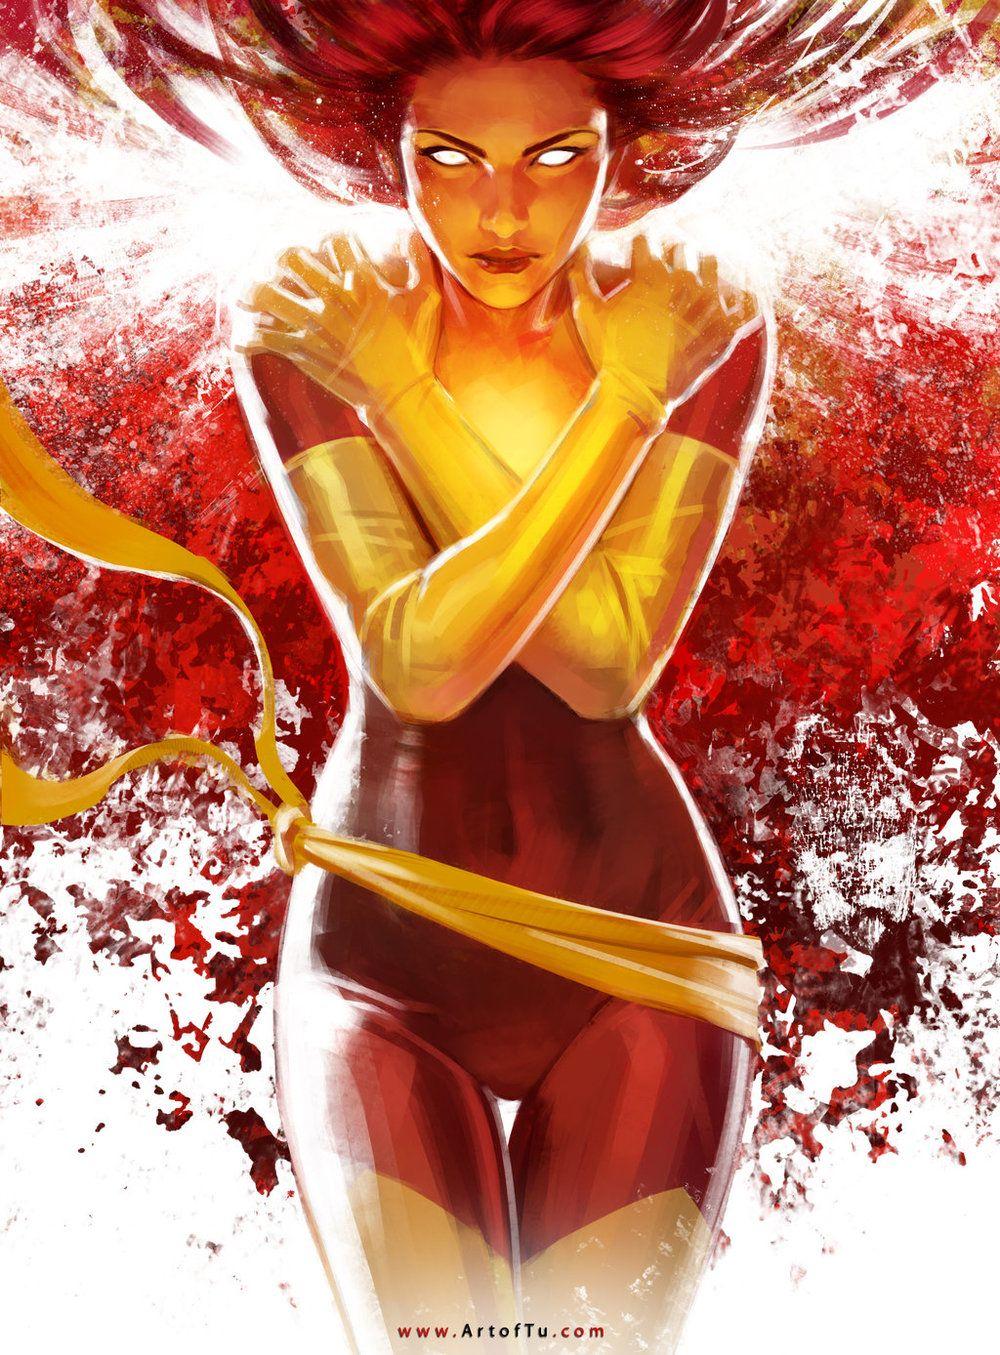 Superb Phoenix Art by Tu Bui